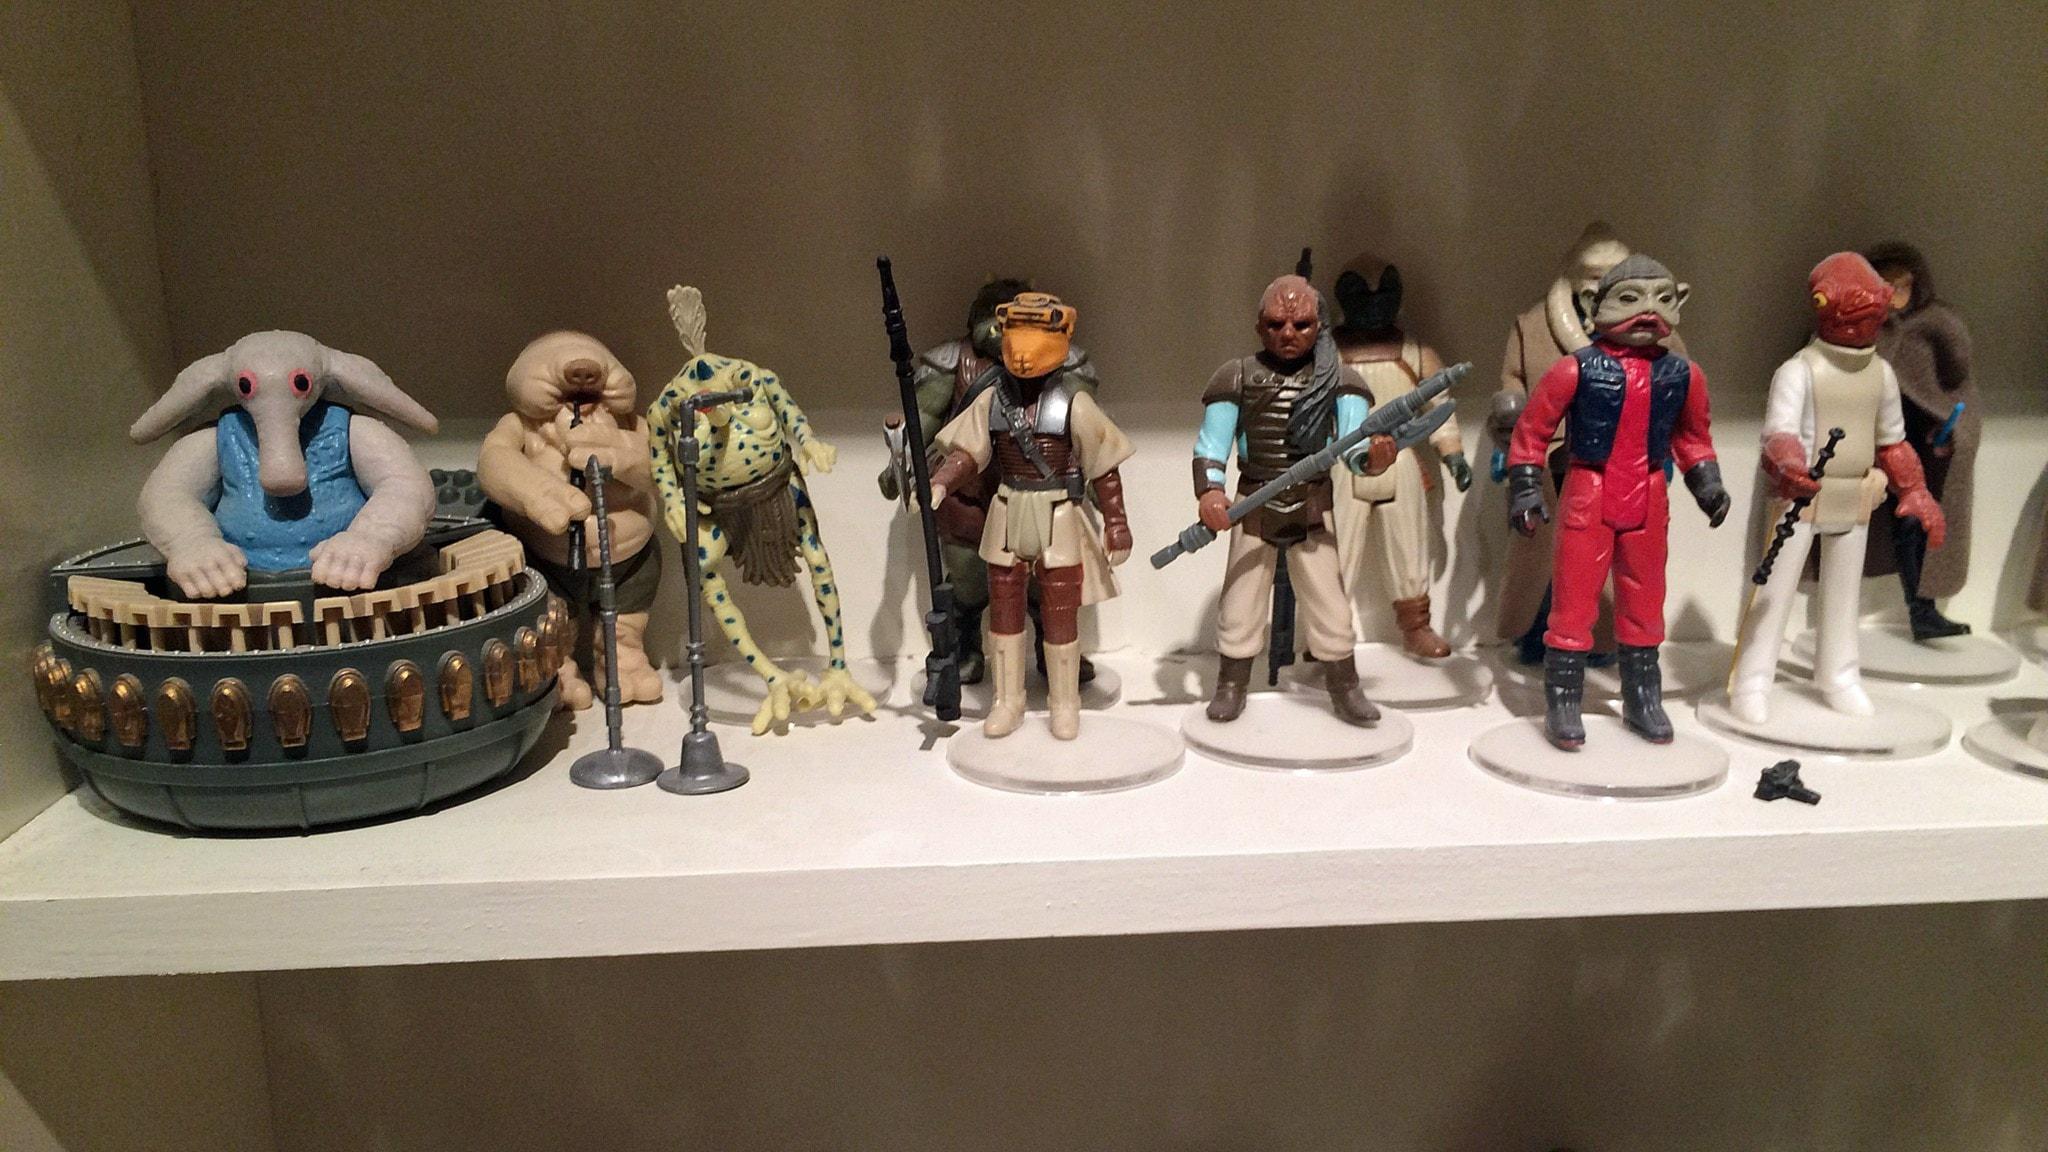 V 51 Star Wars: the force awakens! Och norsk sorg